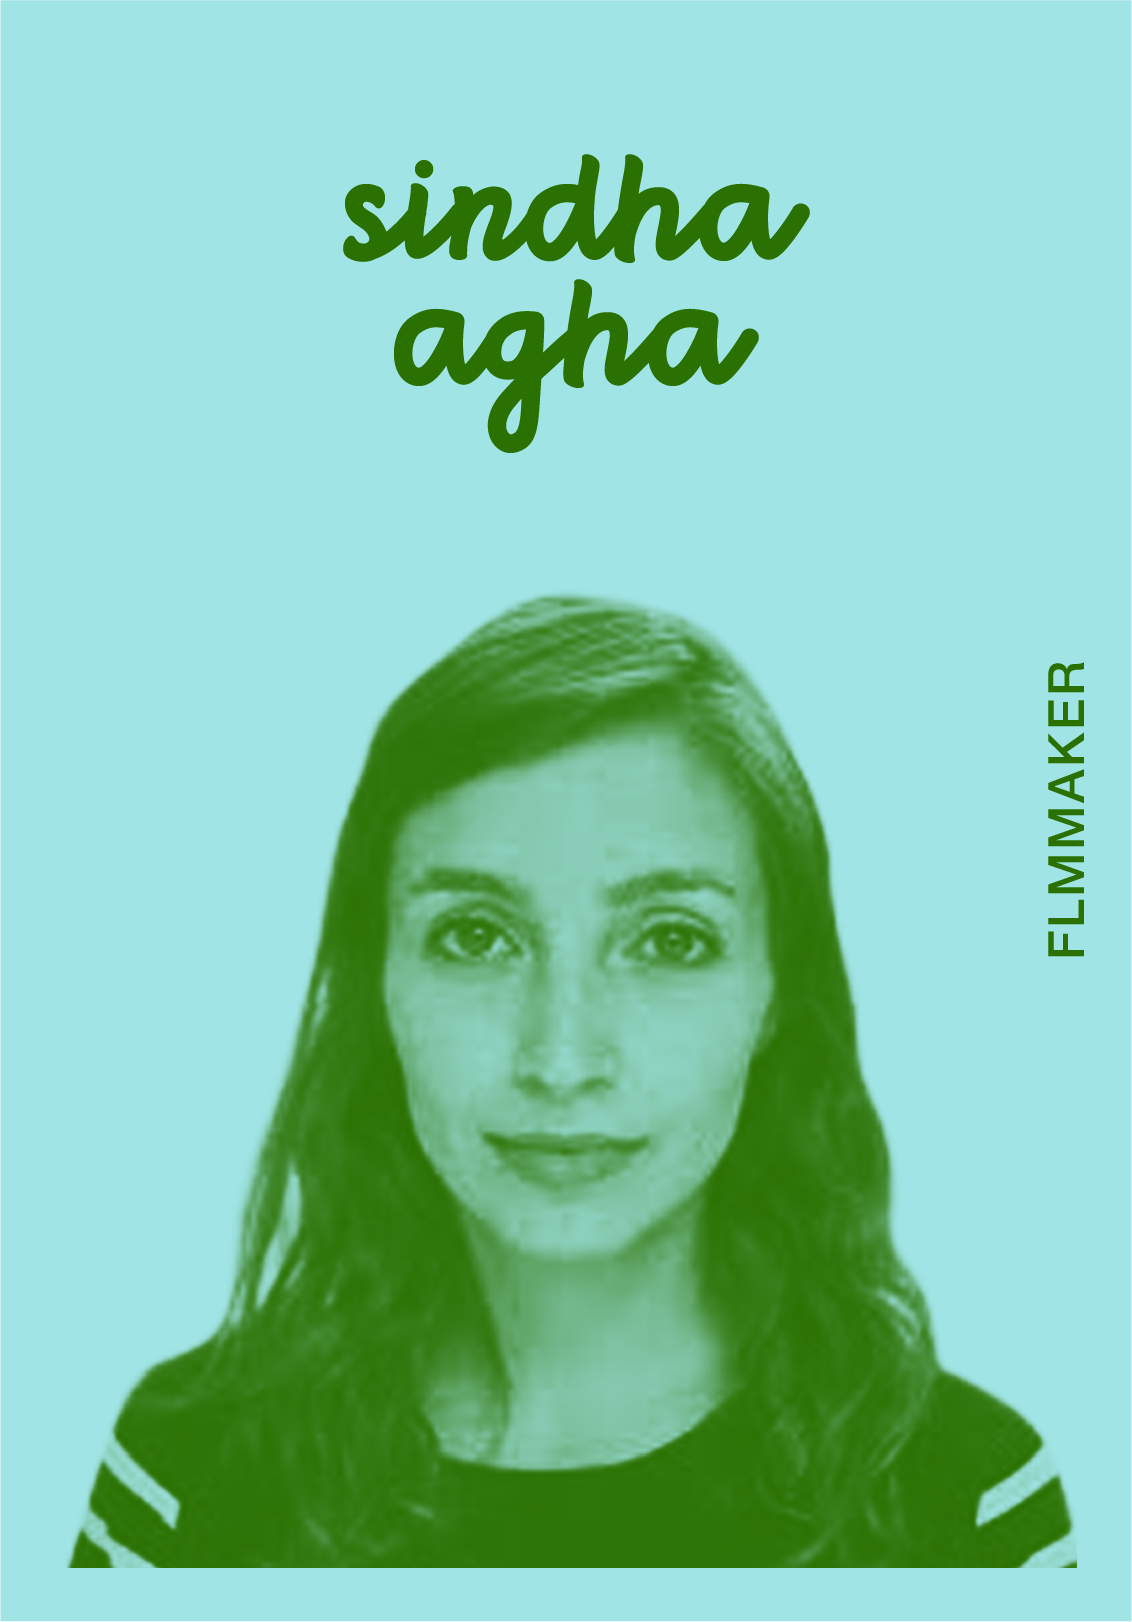 SINDHA AGHA   WEBSITE   @SINDHAAGHA   IG: SINDHAS